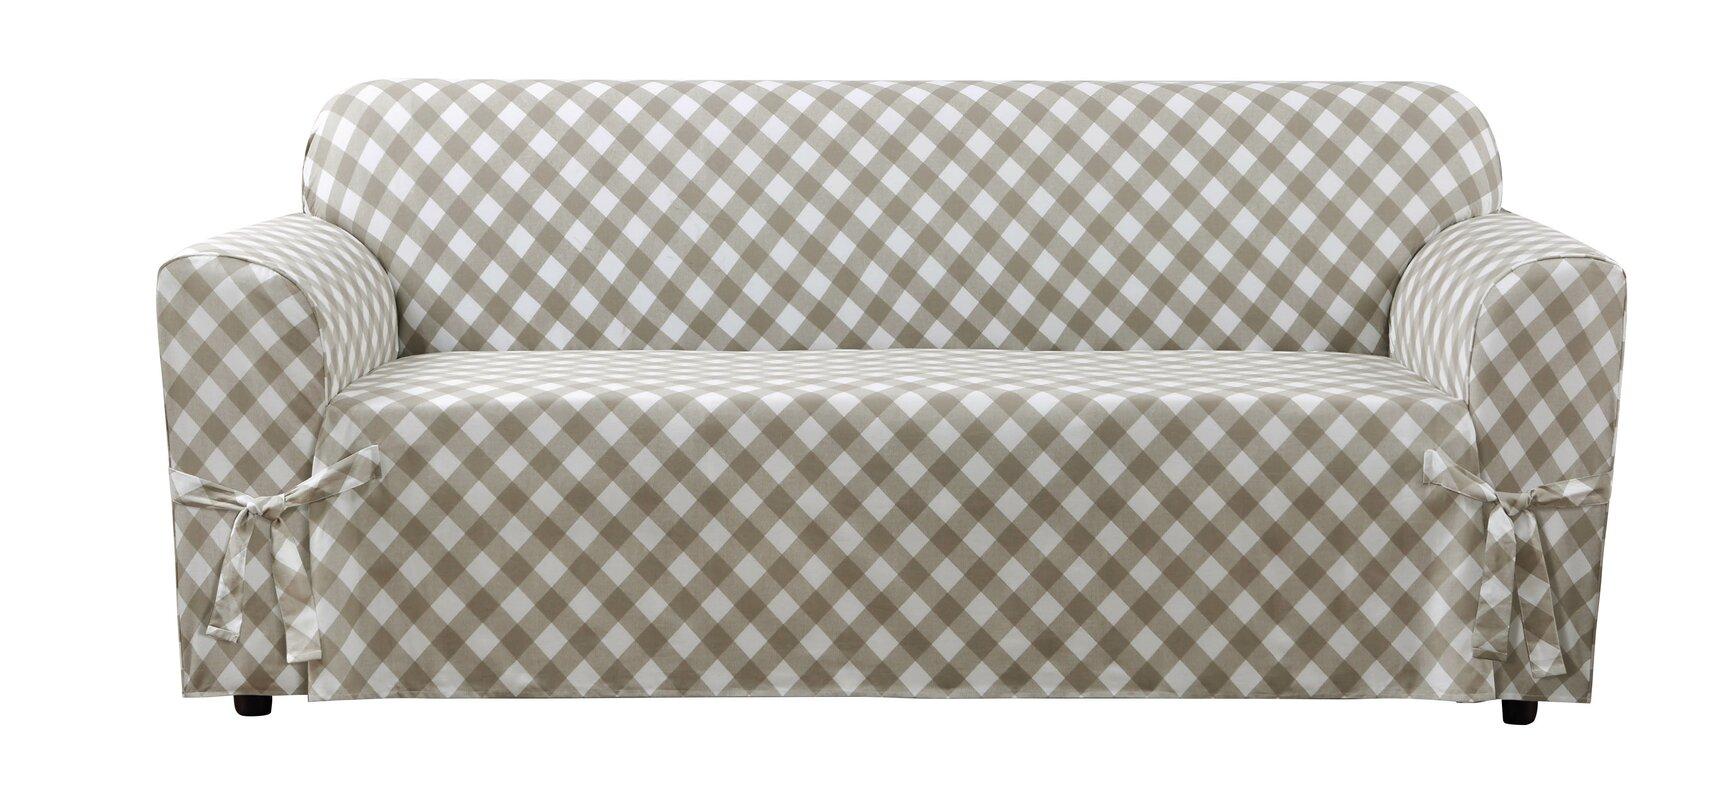 Buffalo Check Box Cushion Sofa Slipcover